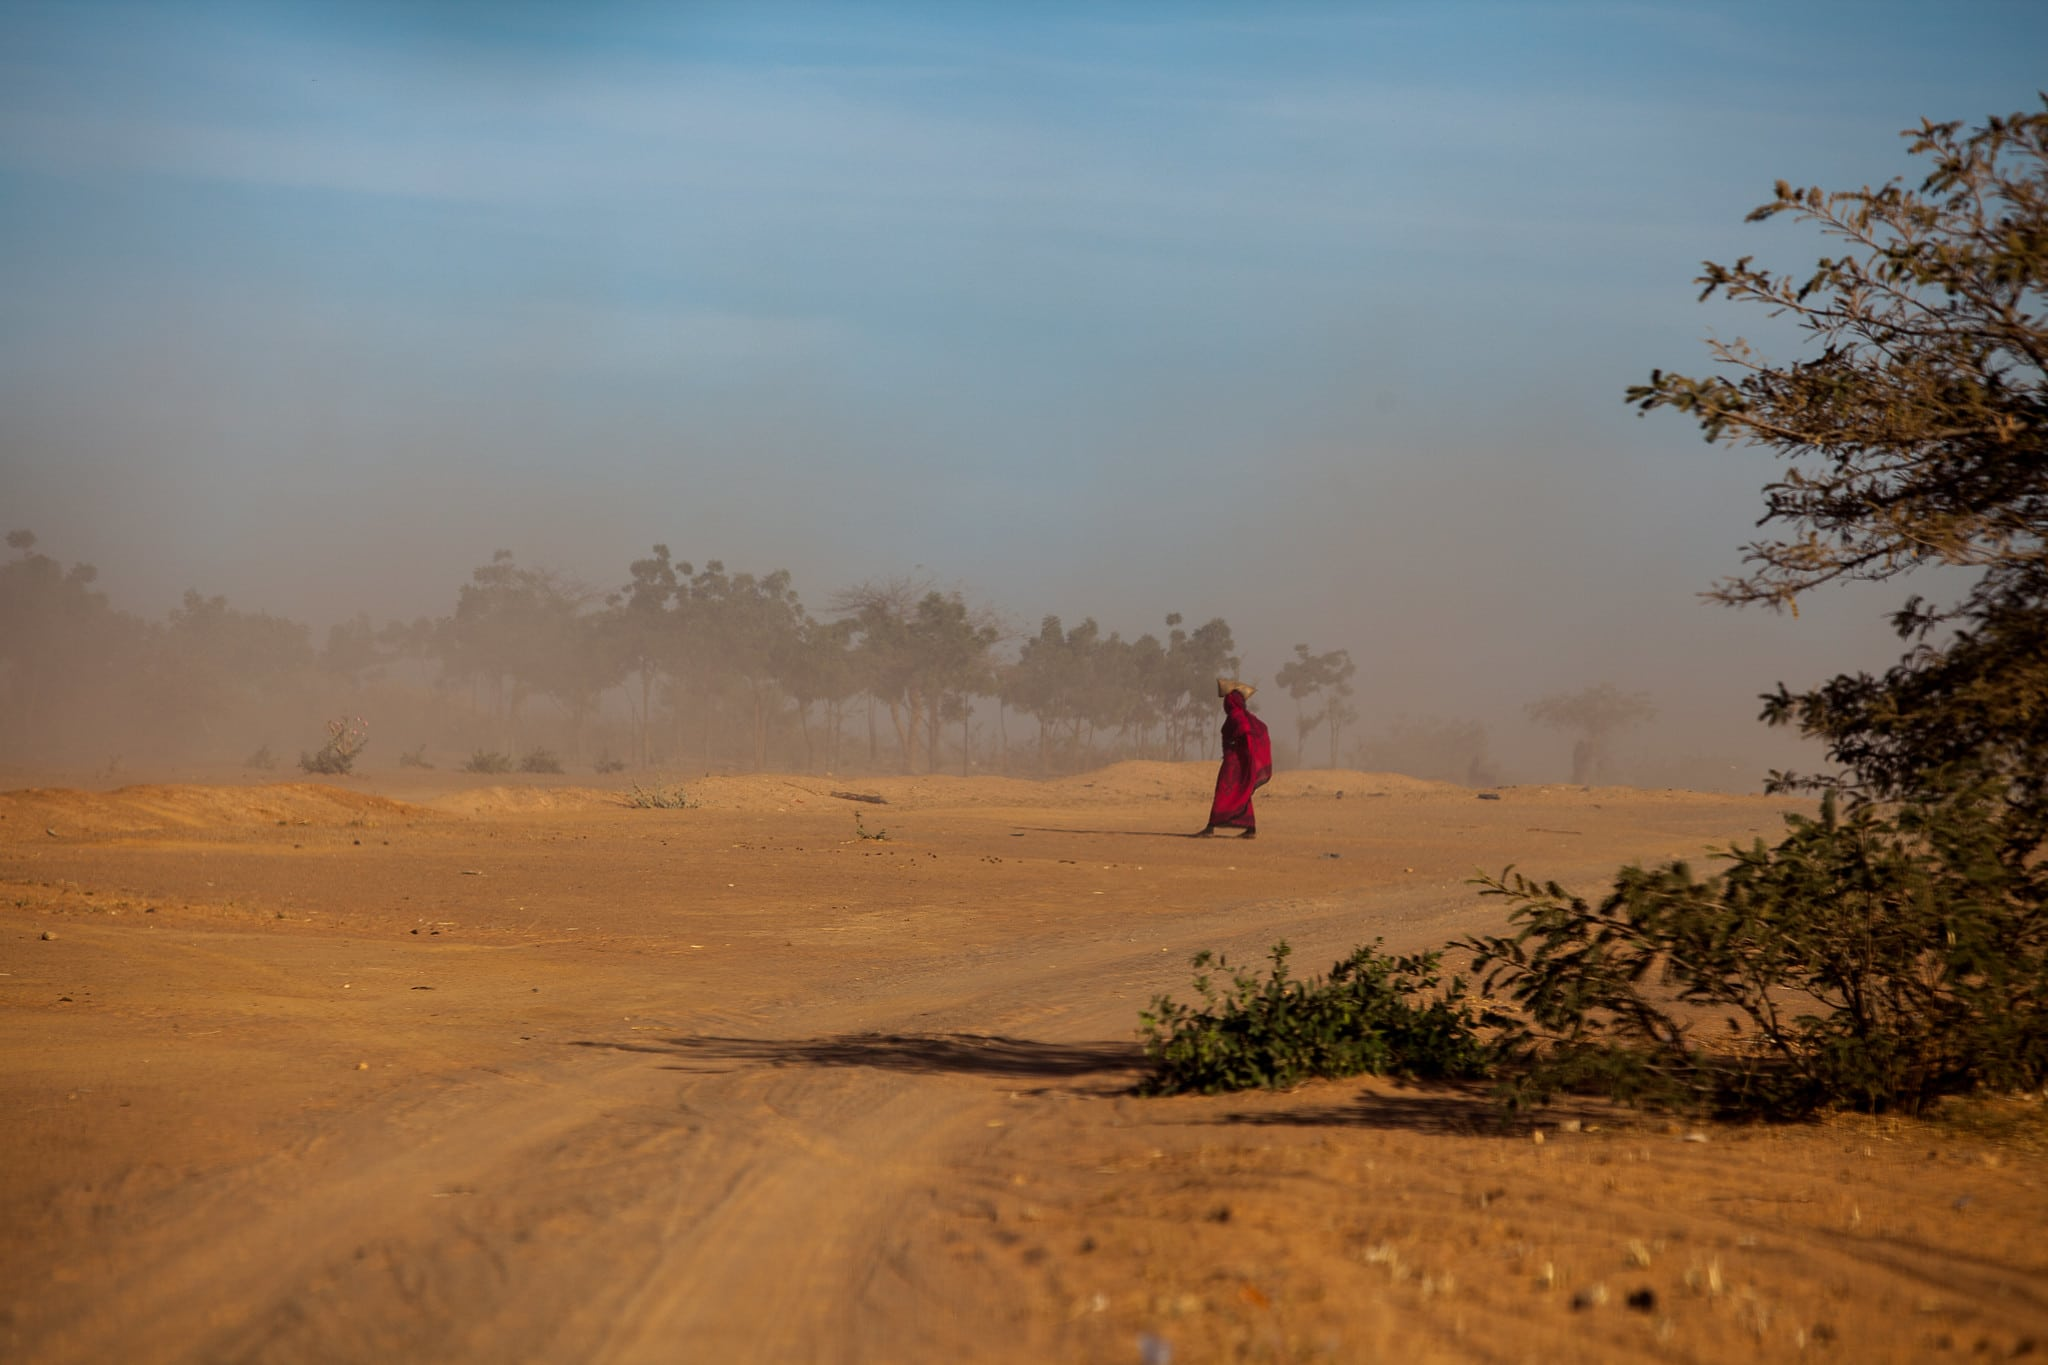 Woman walks along a dusty dirt road in Chad